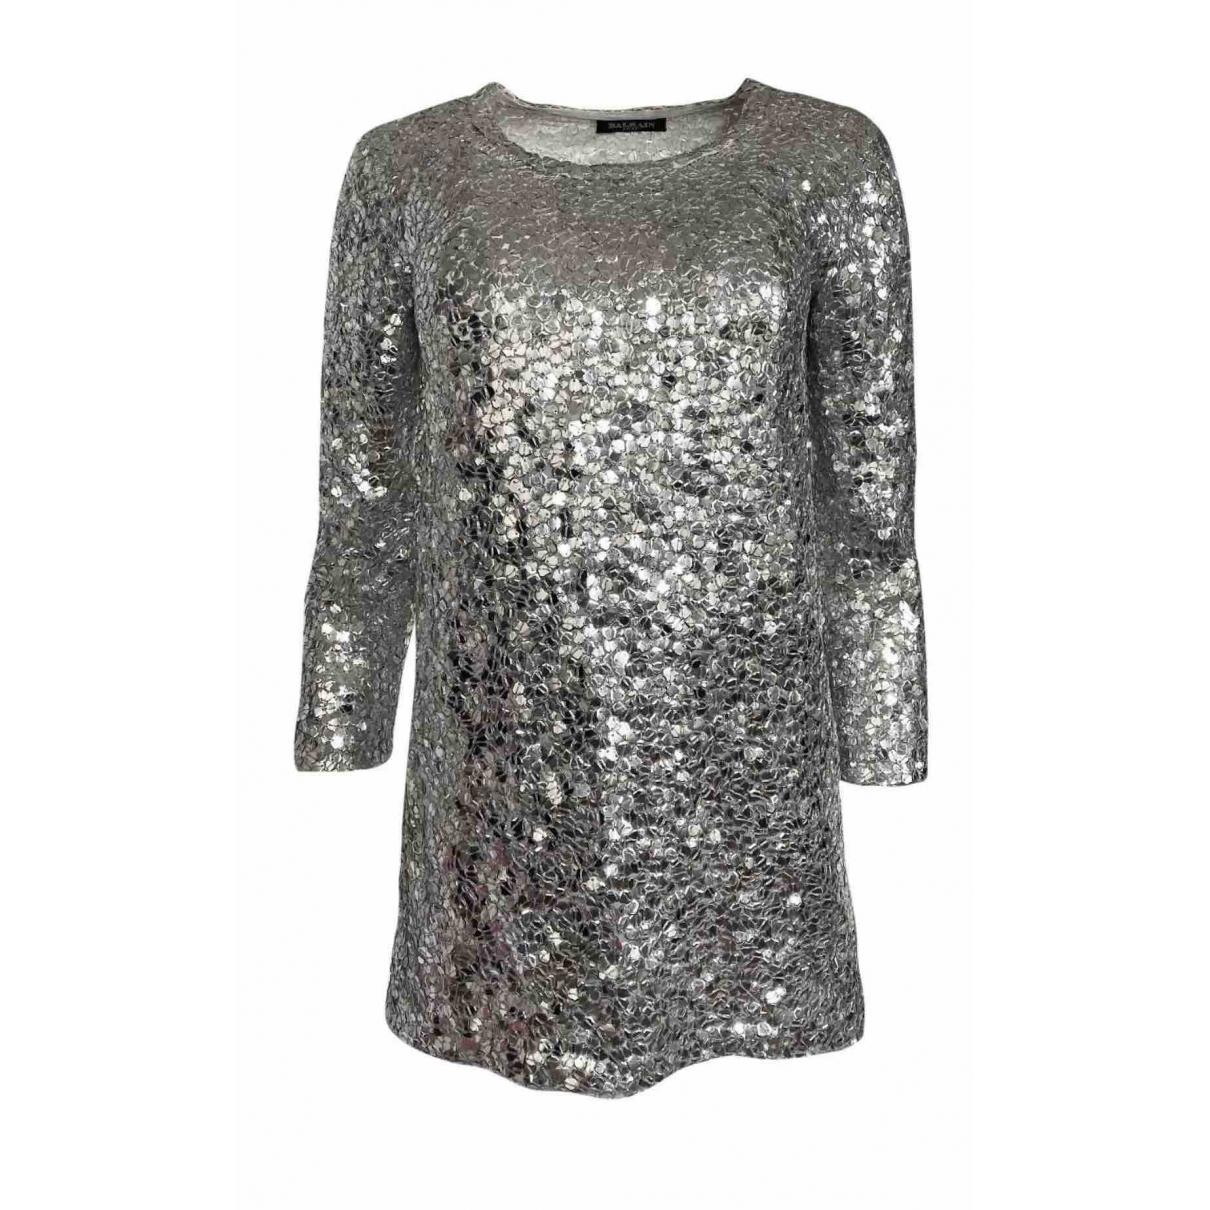 Balmain \N Silver Glitter dress for Women 36 FR